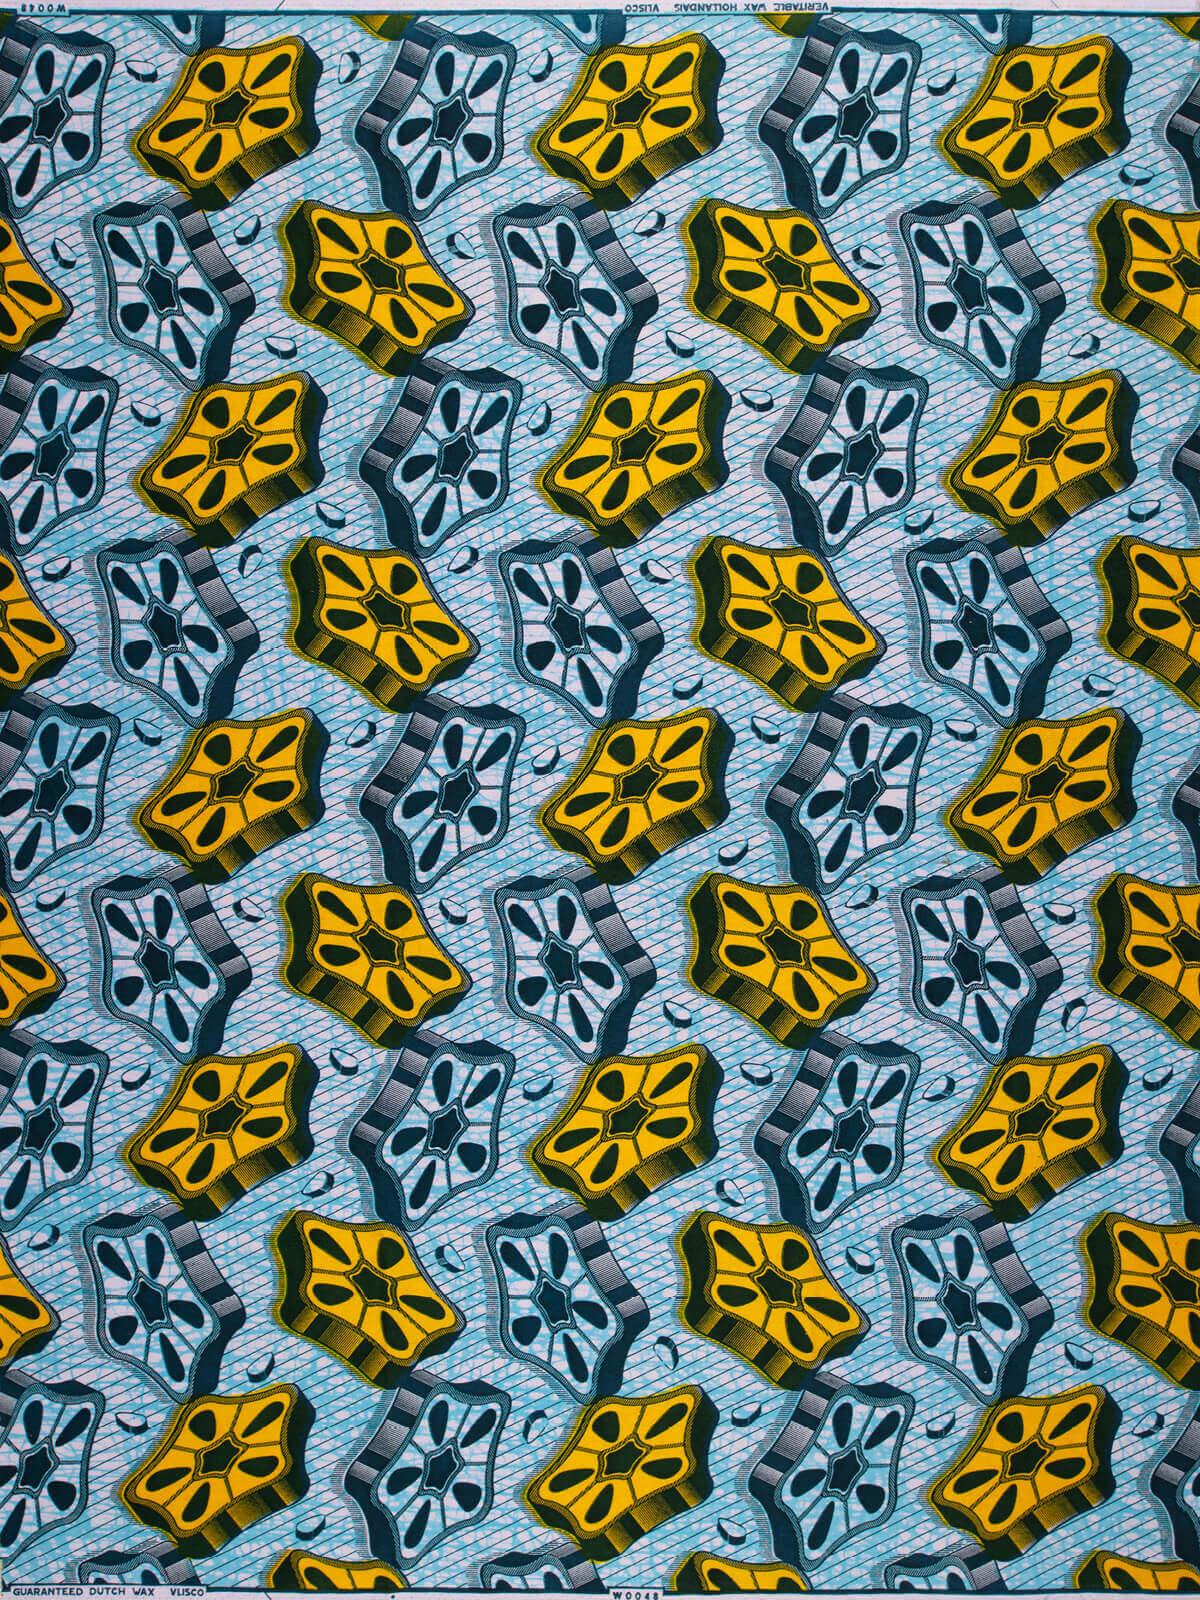 5 Vlw0048 008 Lookbook Fabric W29 8